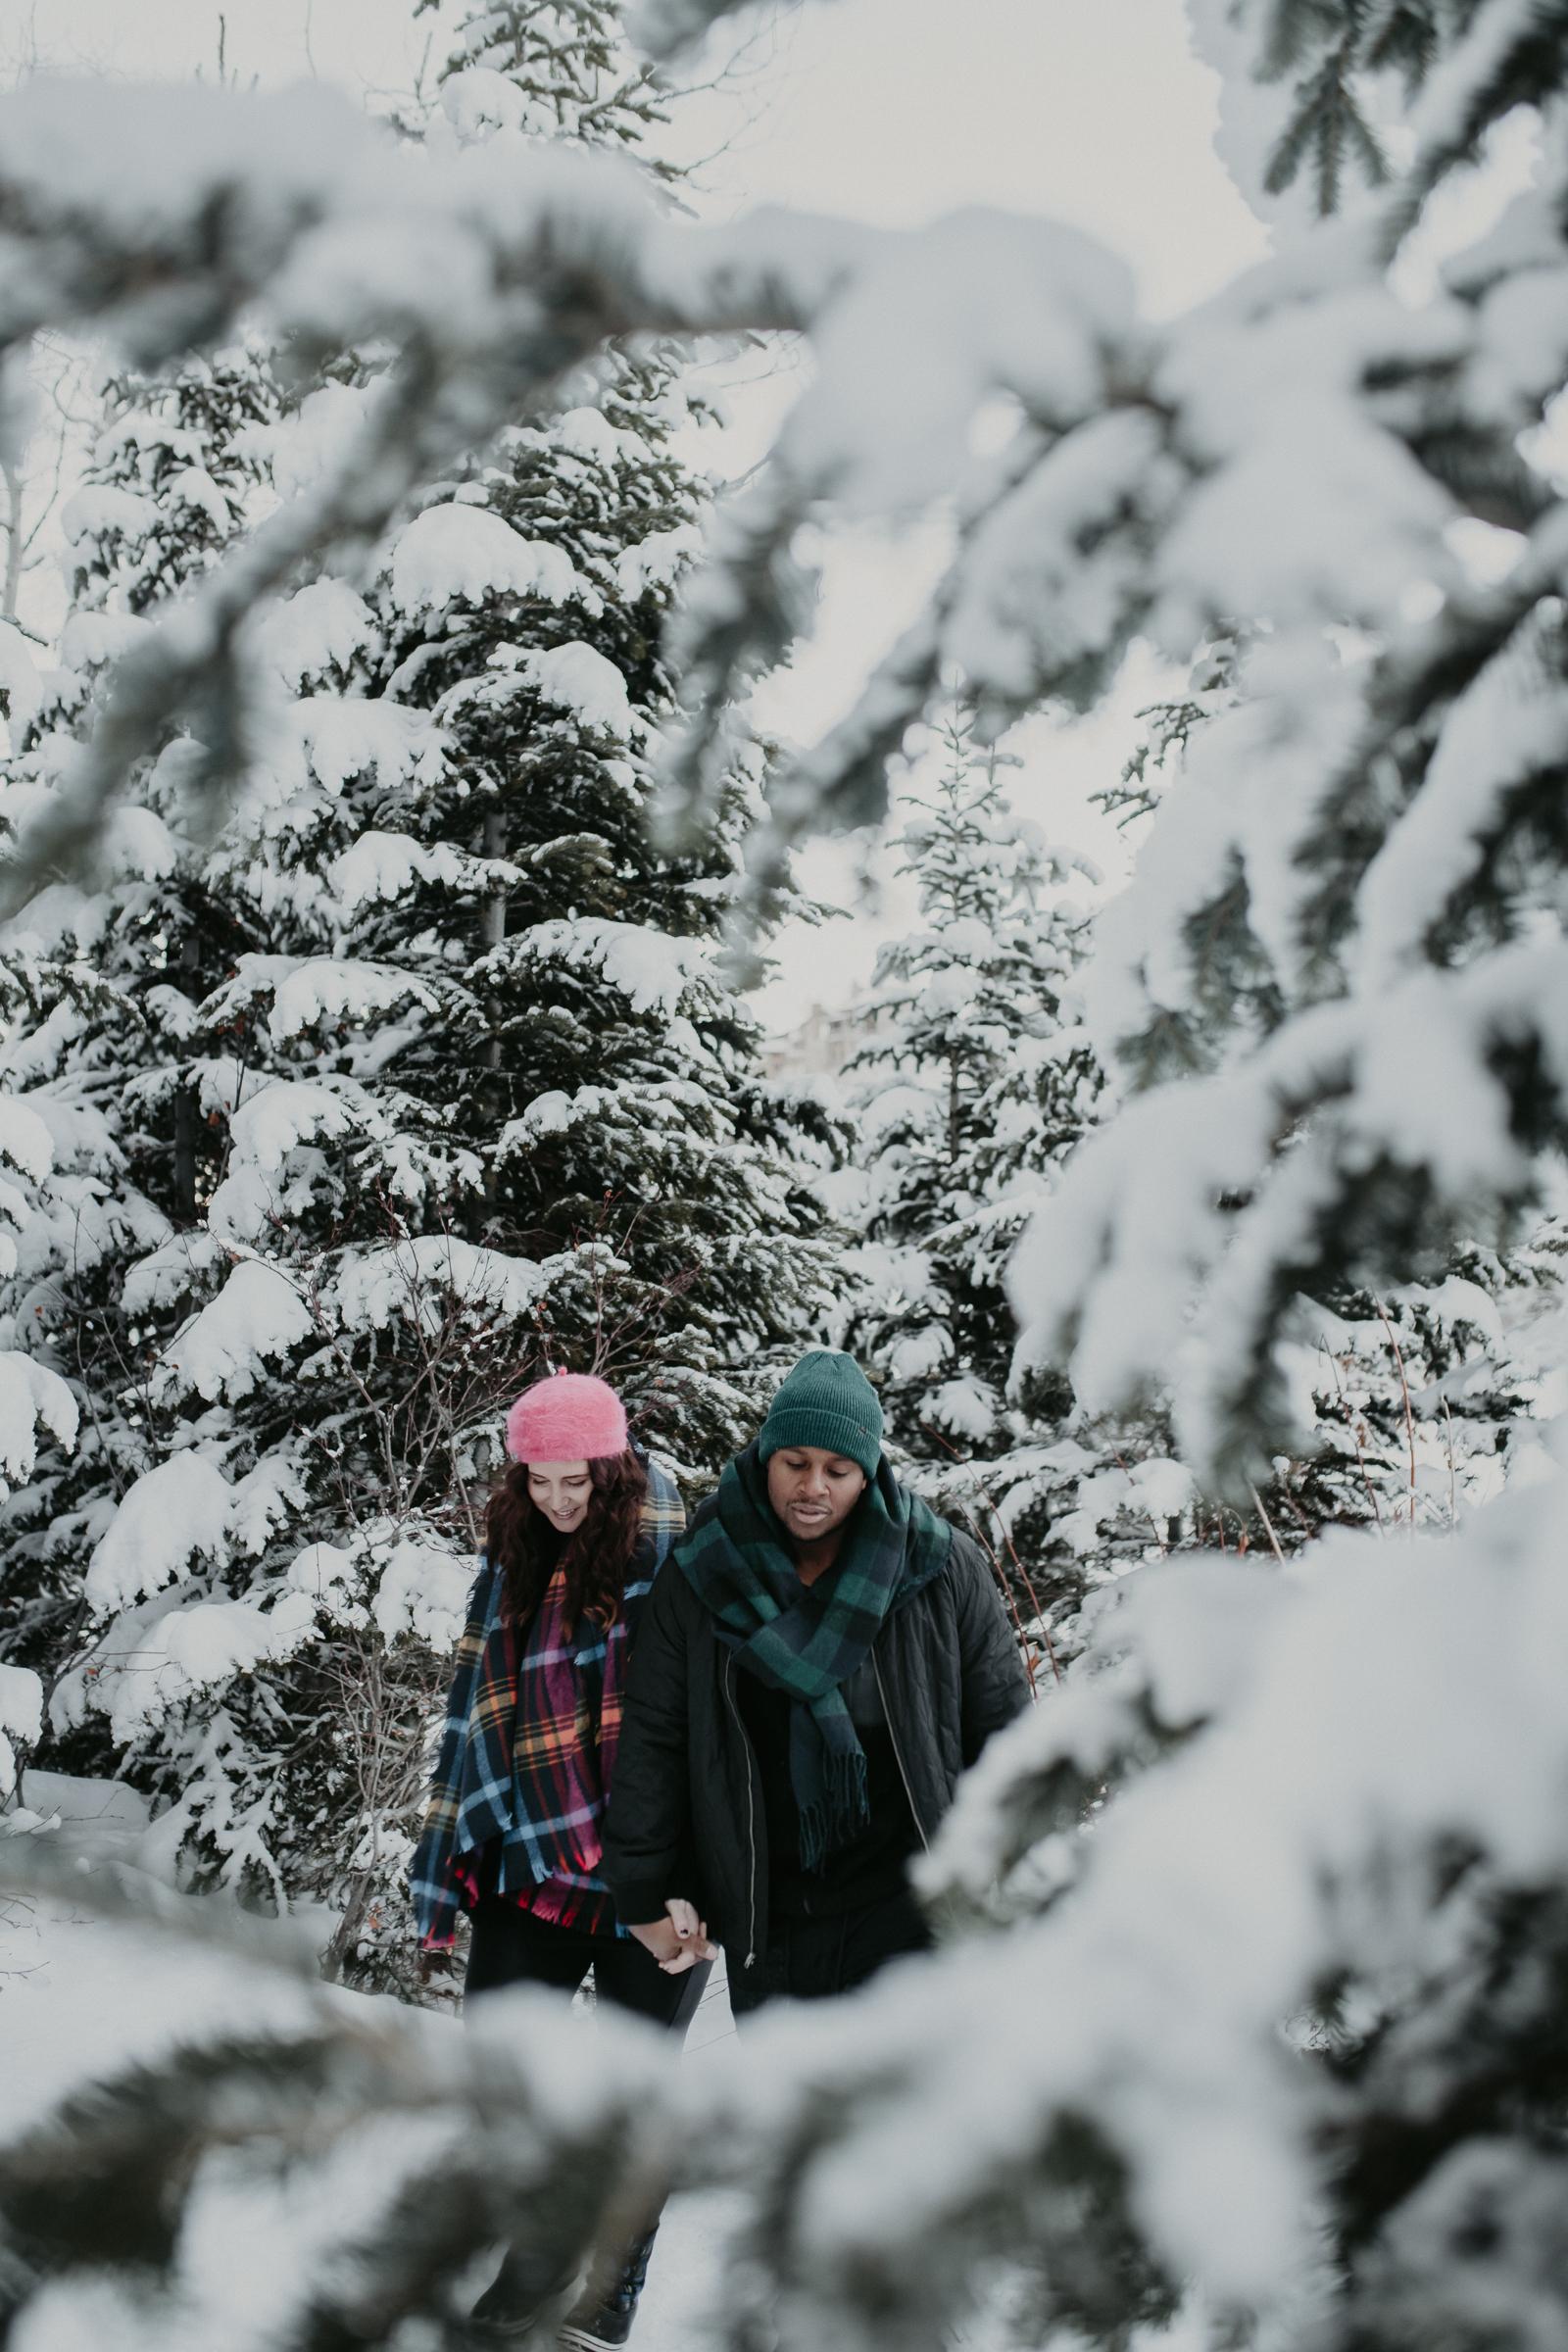 Couple walking through trees in snowy mountains